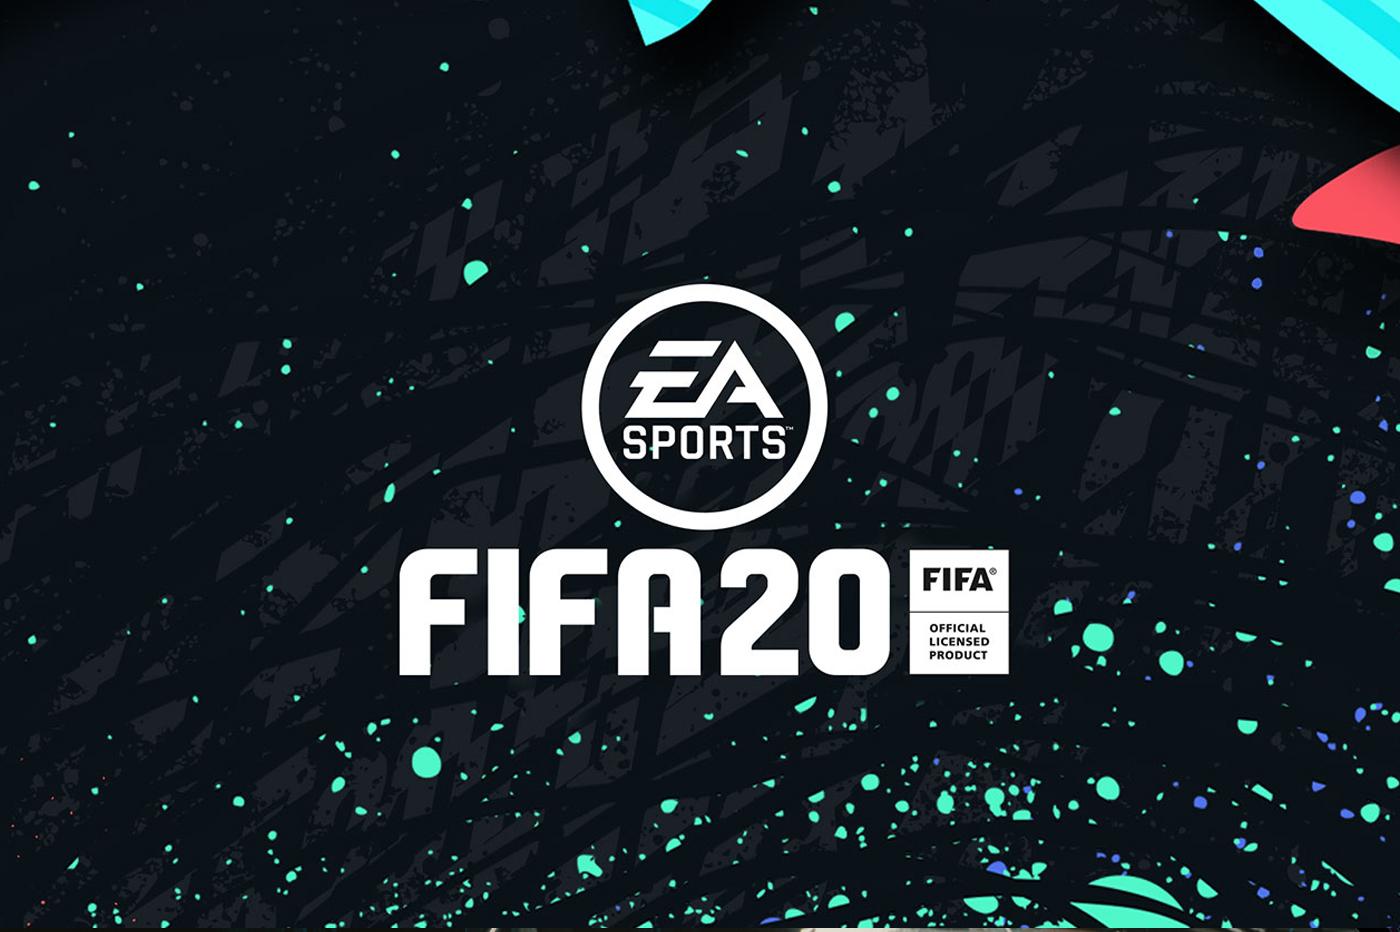 Où acheter FIFA 20 ?